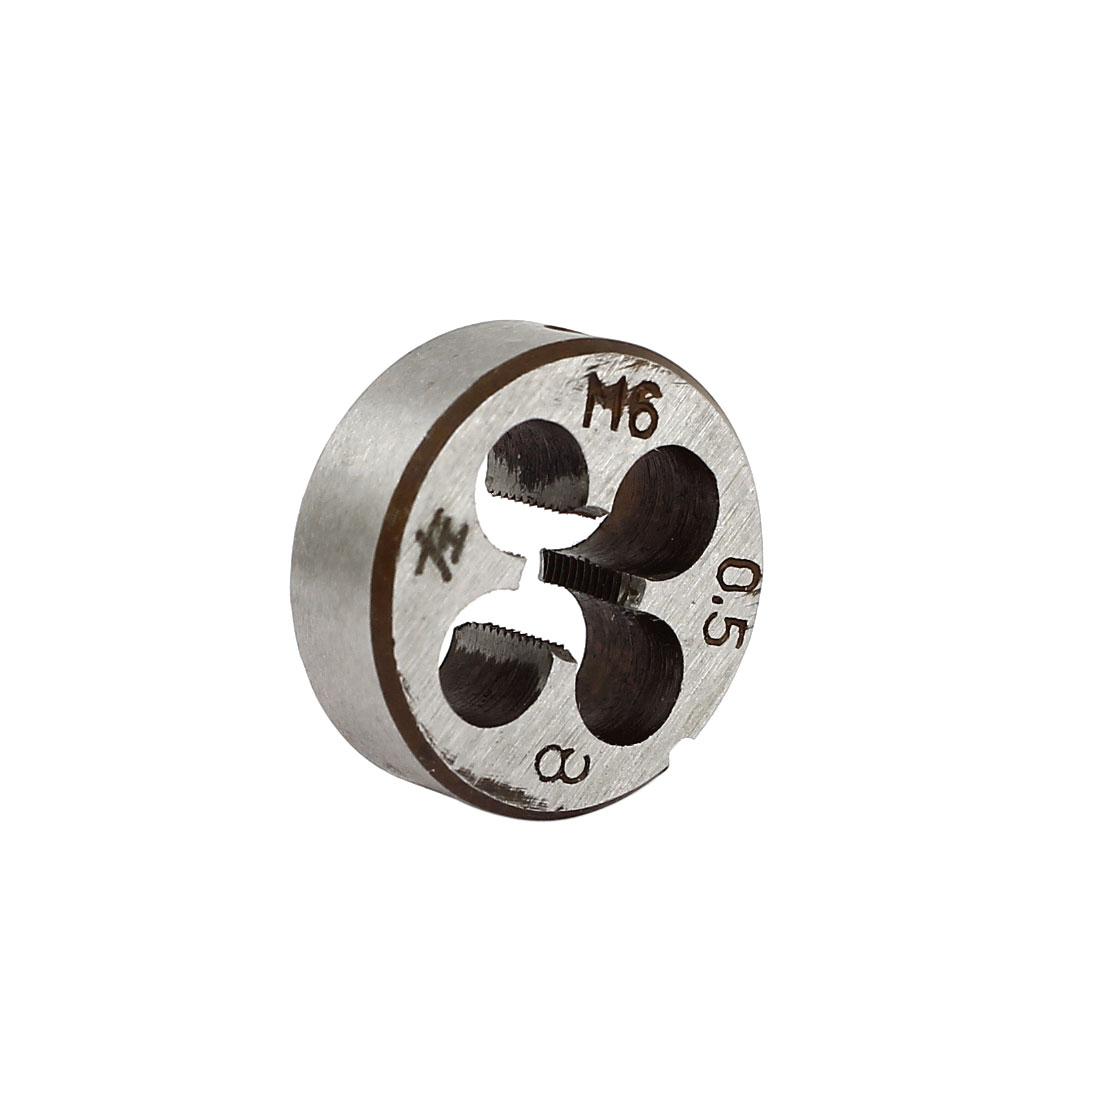 M6 x 0.5mm Metric 20mm OD Dia Steel Round Threading Die Thread Cutting Tool